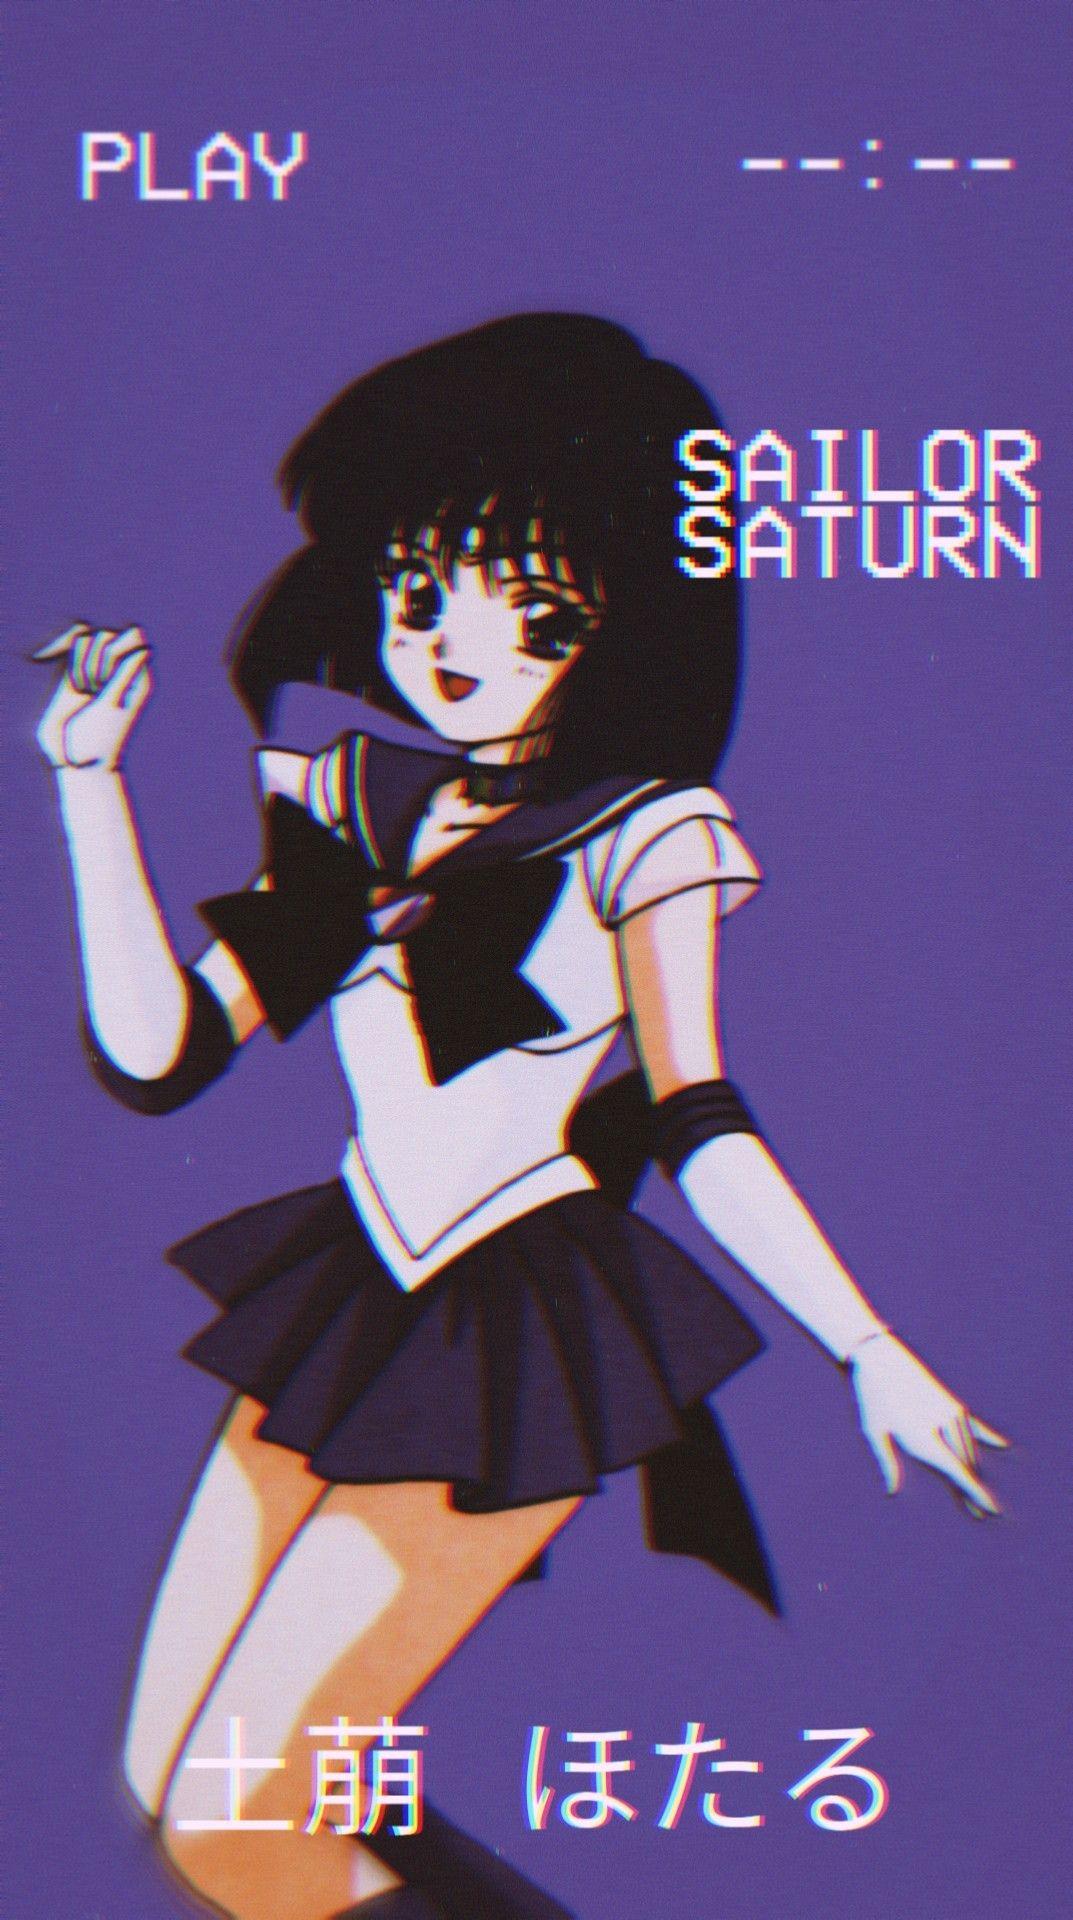 Pin By Daryn On Soleil Et Pluie Sailor Moon Wallpaper Sailor Saturn Sailor Moon Girls